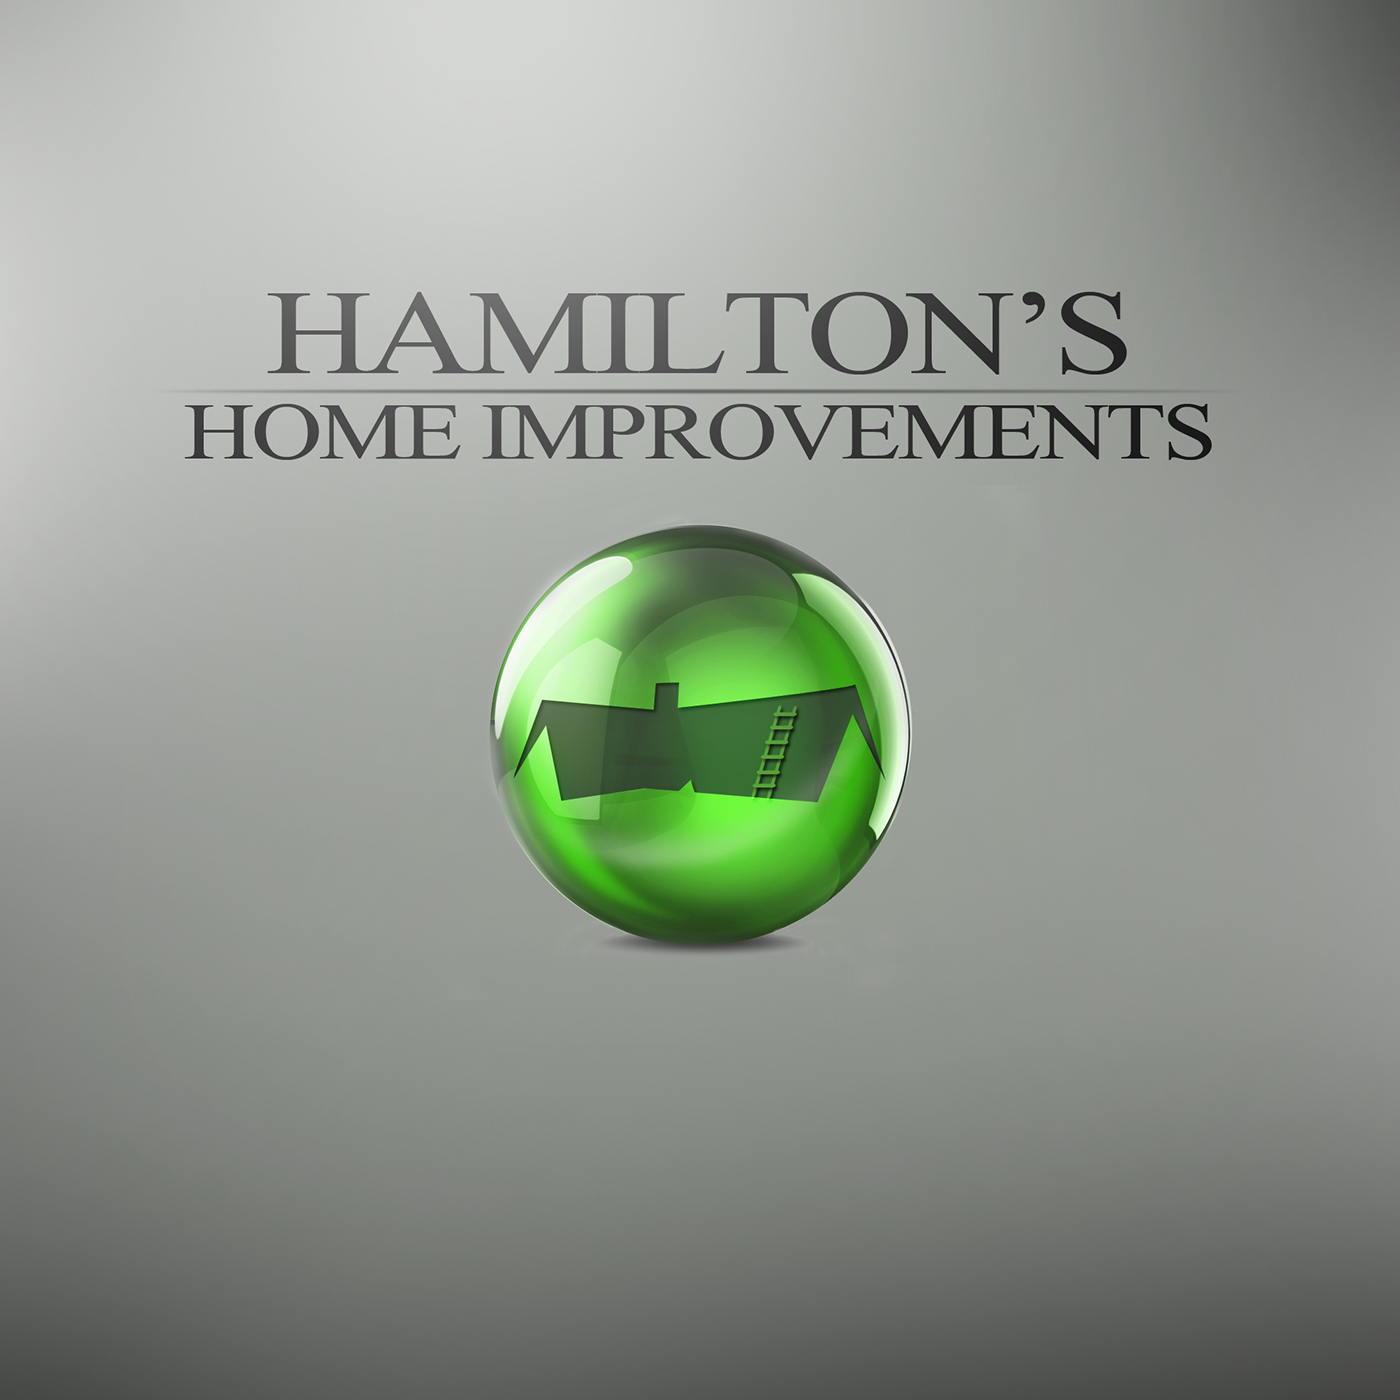 Hamilton 39 S Home Improvements Logo Design On Behance